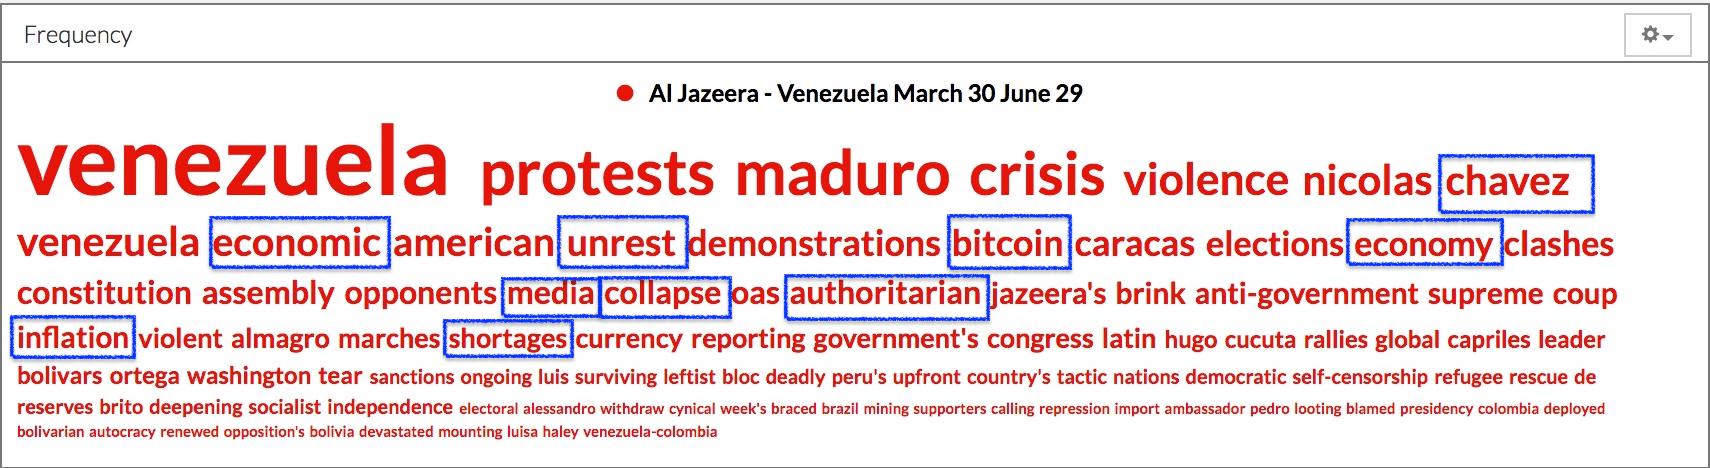 What Does the Media Say is Happening in Venezuela? - Global